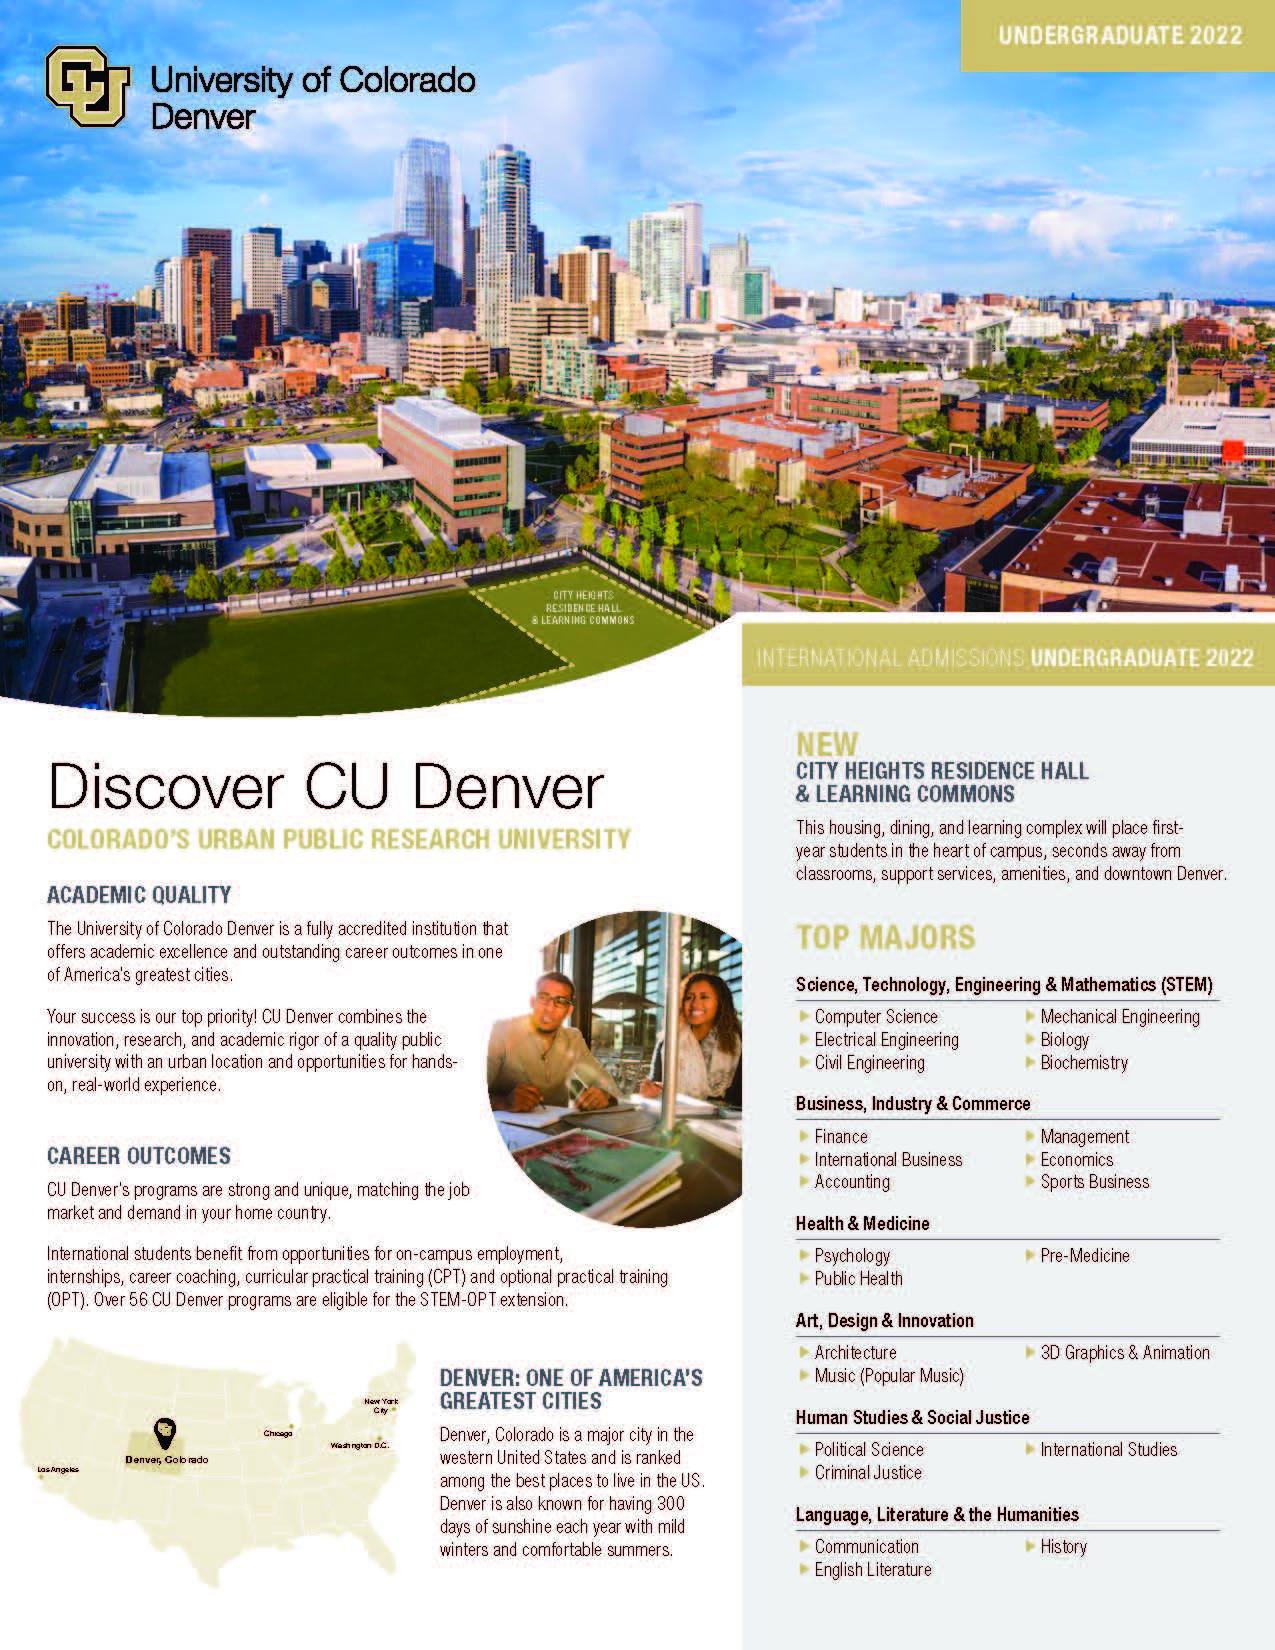 Discover CU Denver (Undergraduates)